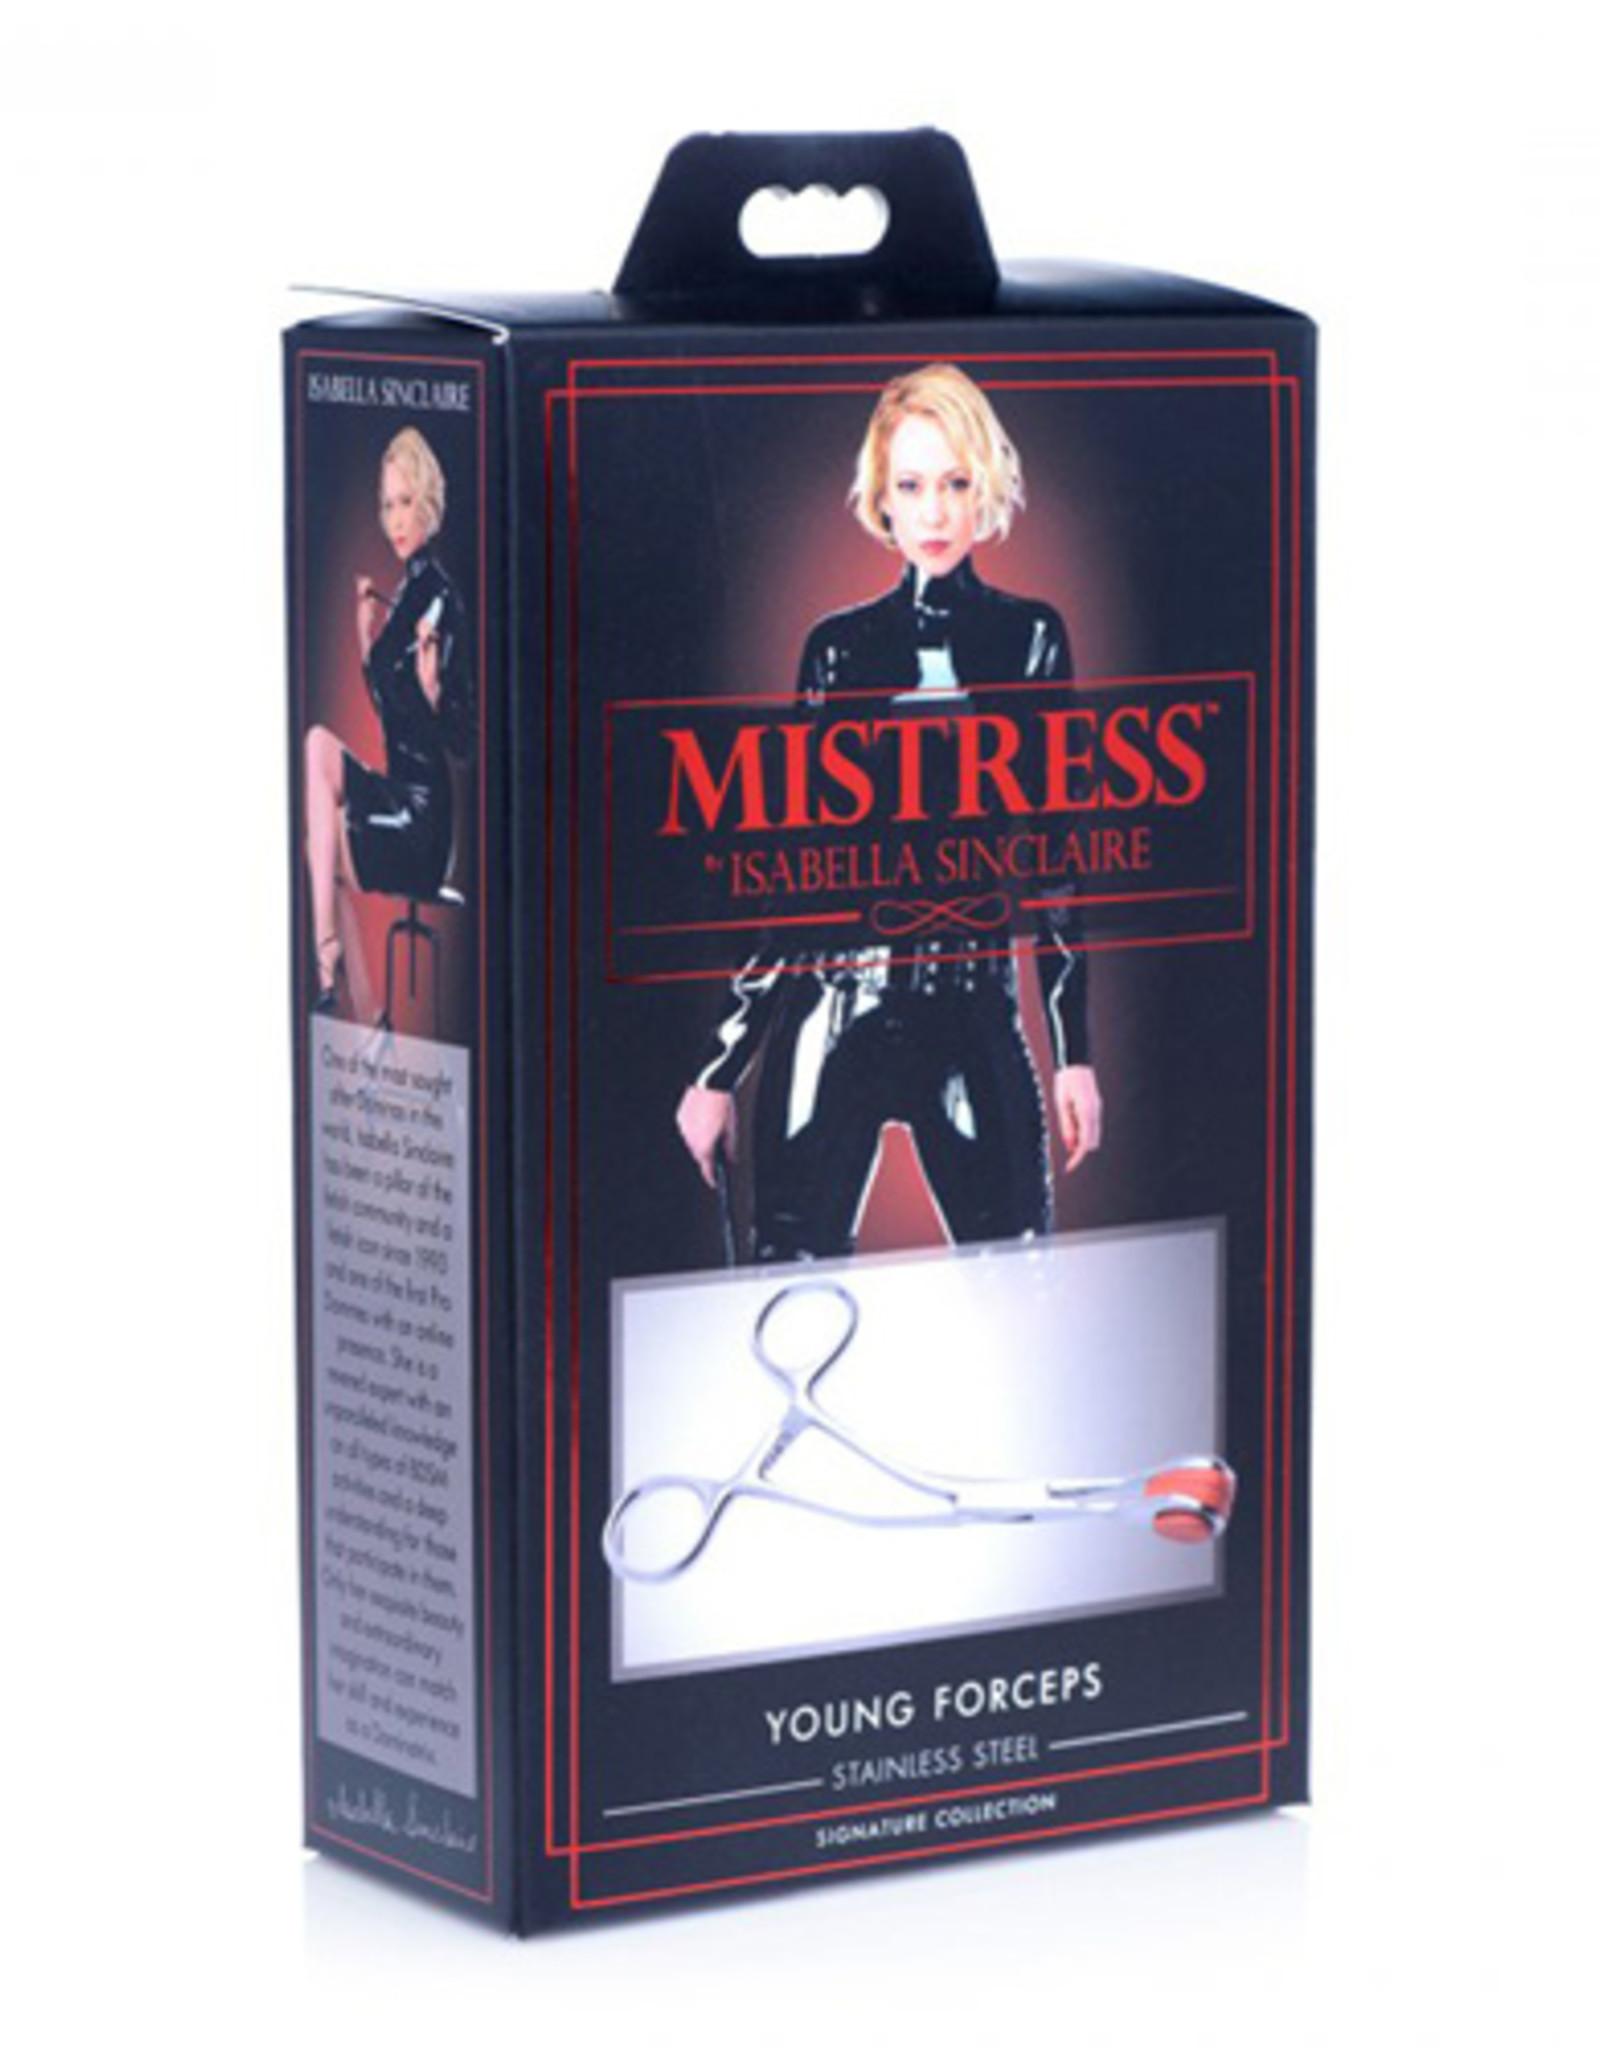 Mistress by Isabella Sinclaire Isabella Sinclaire Klassieke Tepelklem